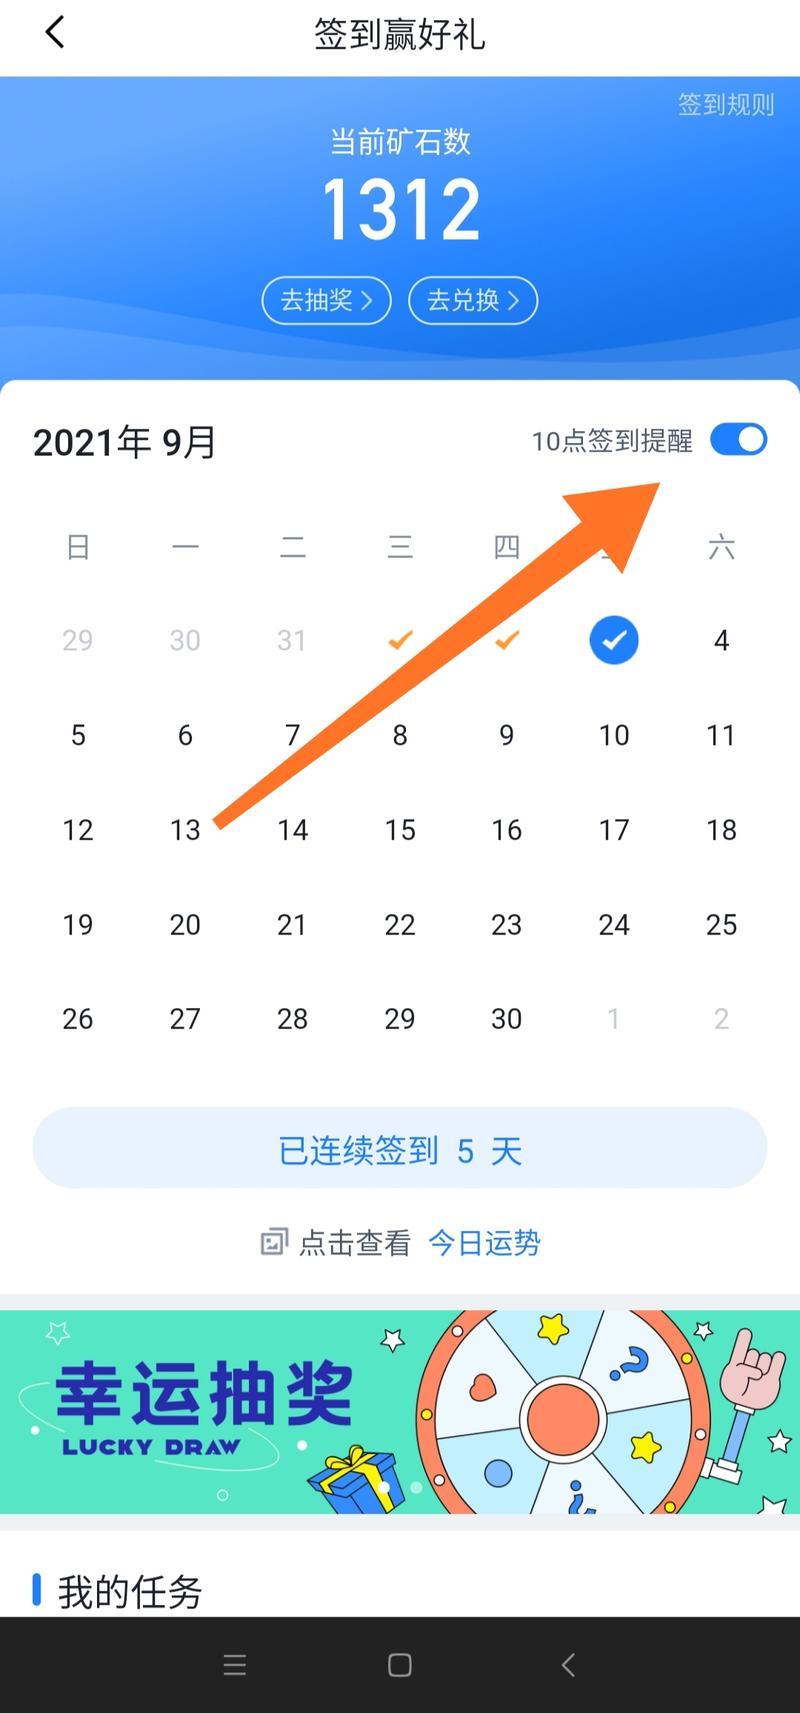 xkzhangsan于2021-09-03 19:01发布的图片